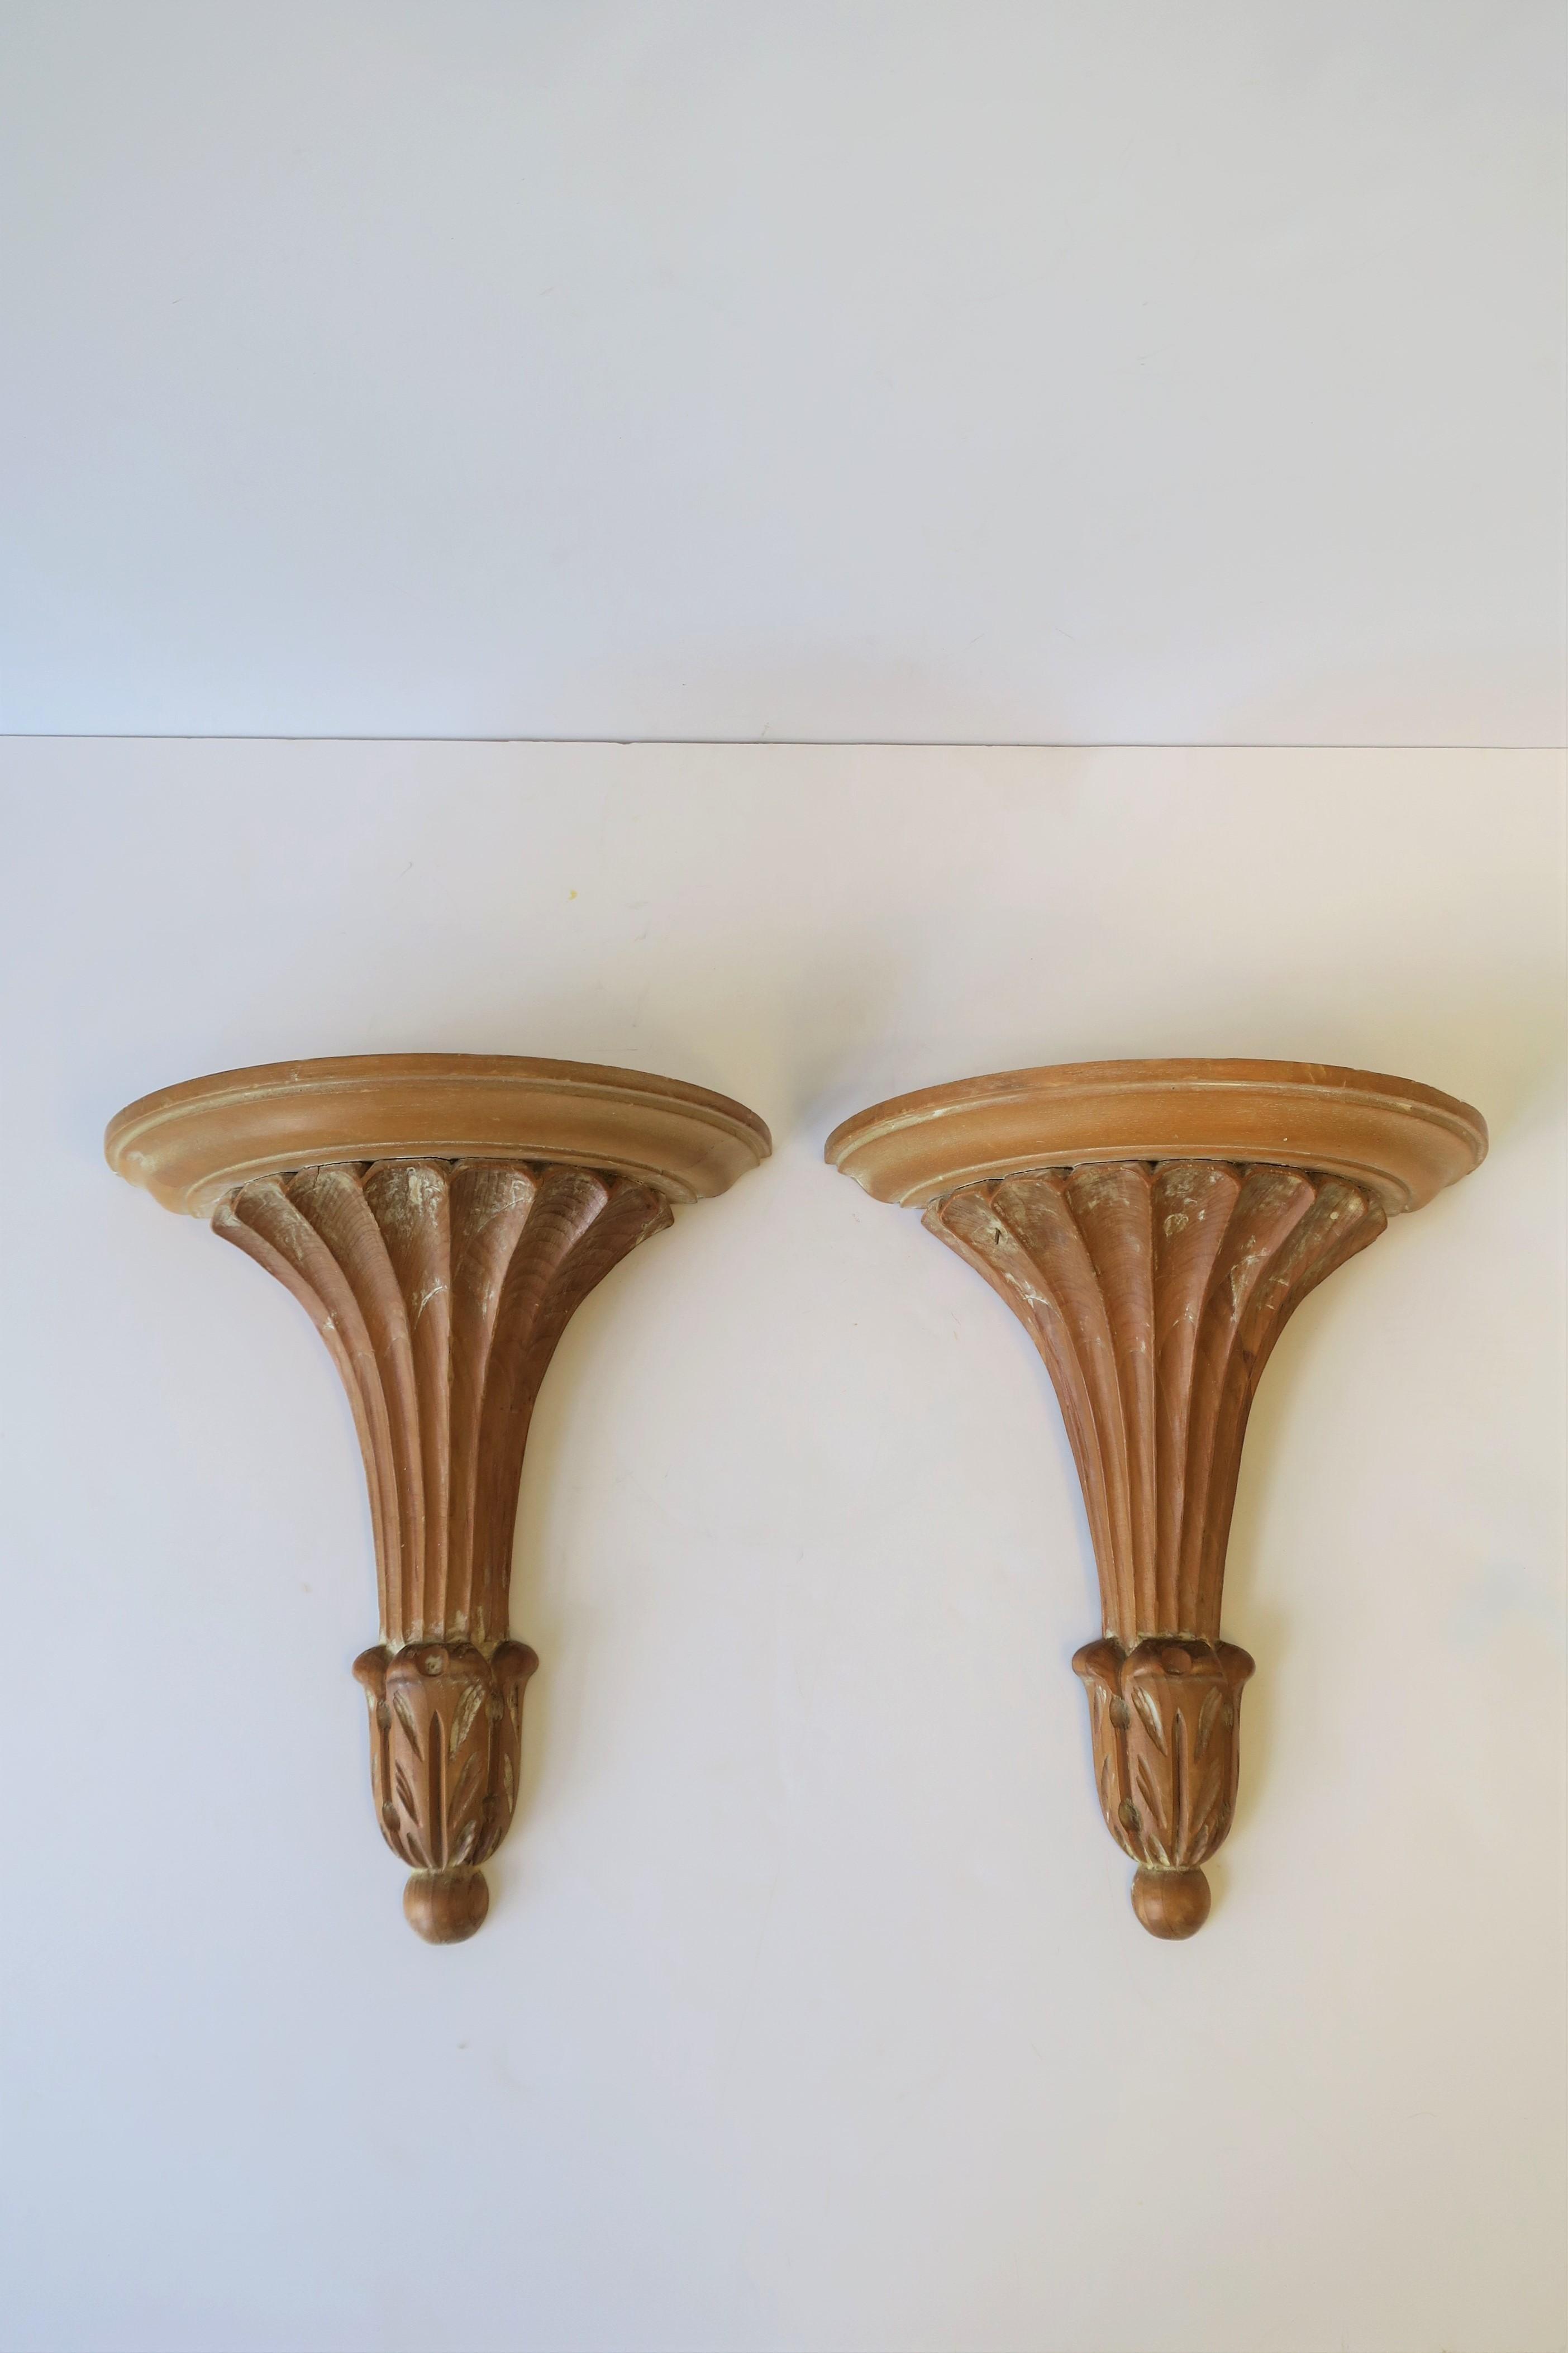 Pair Of Italian Wood Wall Shelf Brackets